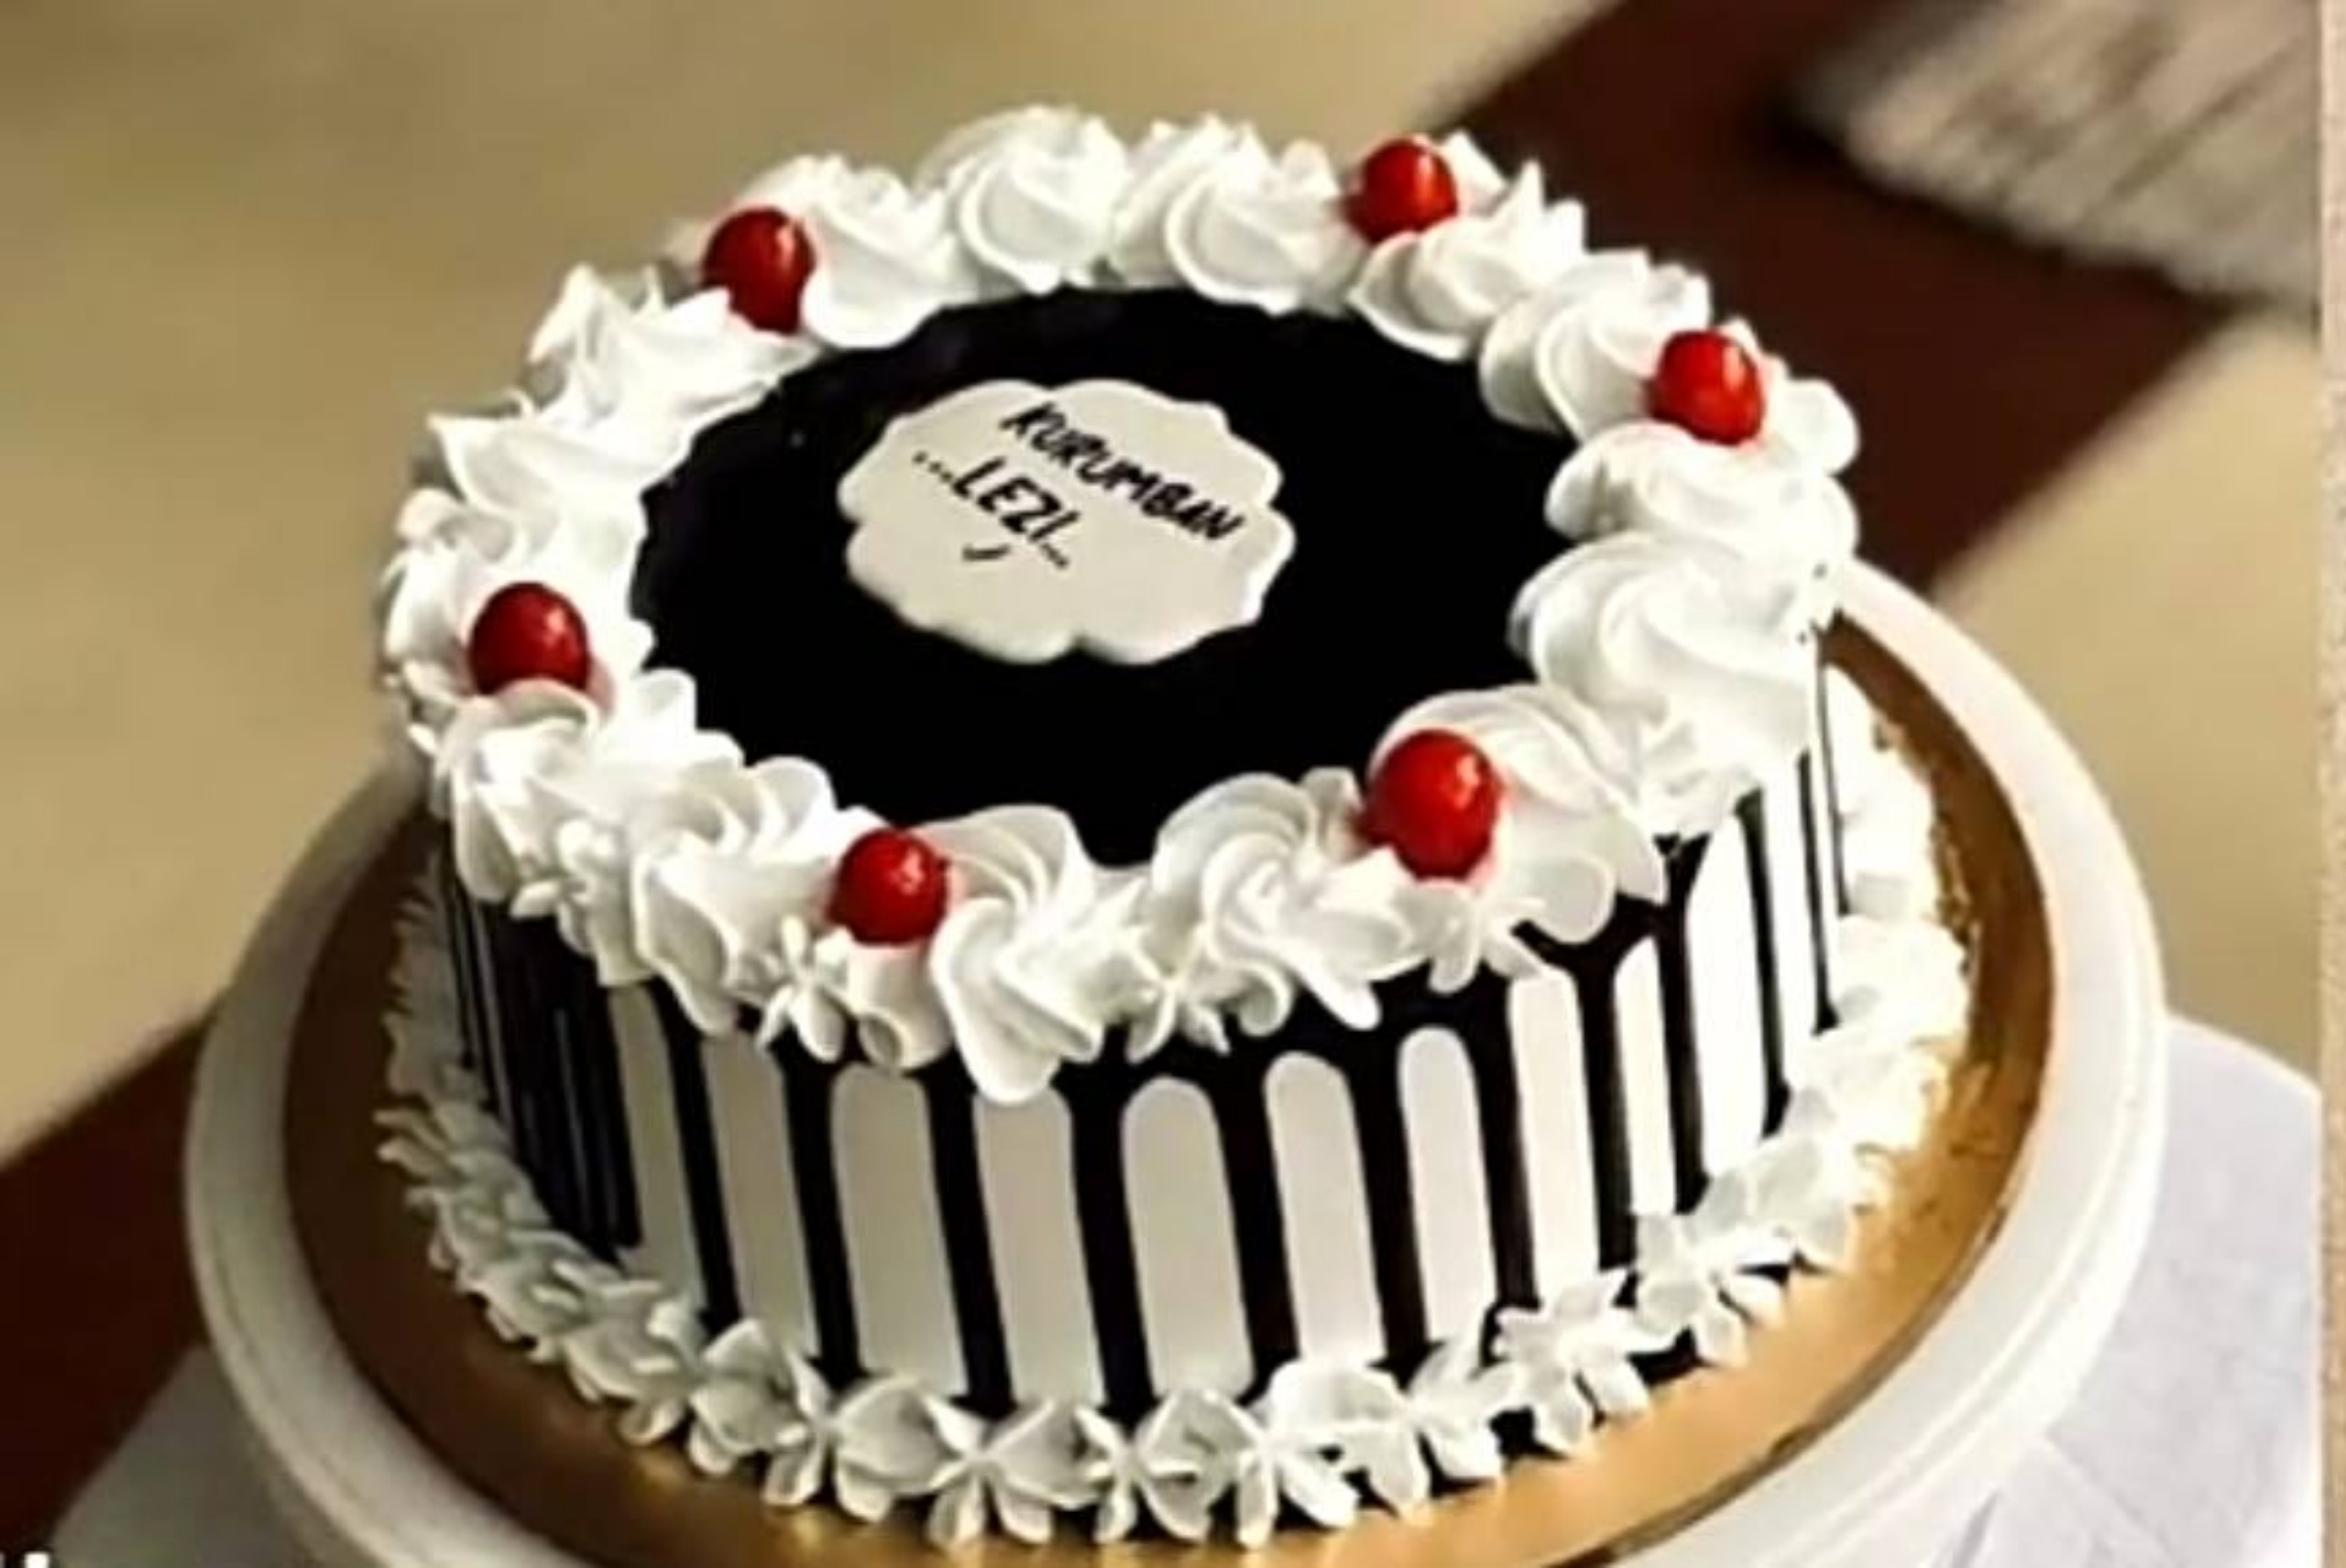 Black Forest Cake - 500 gm